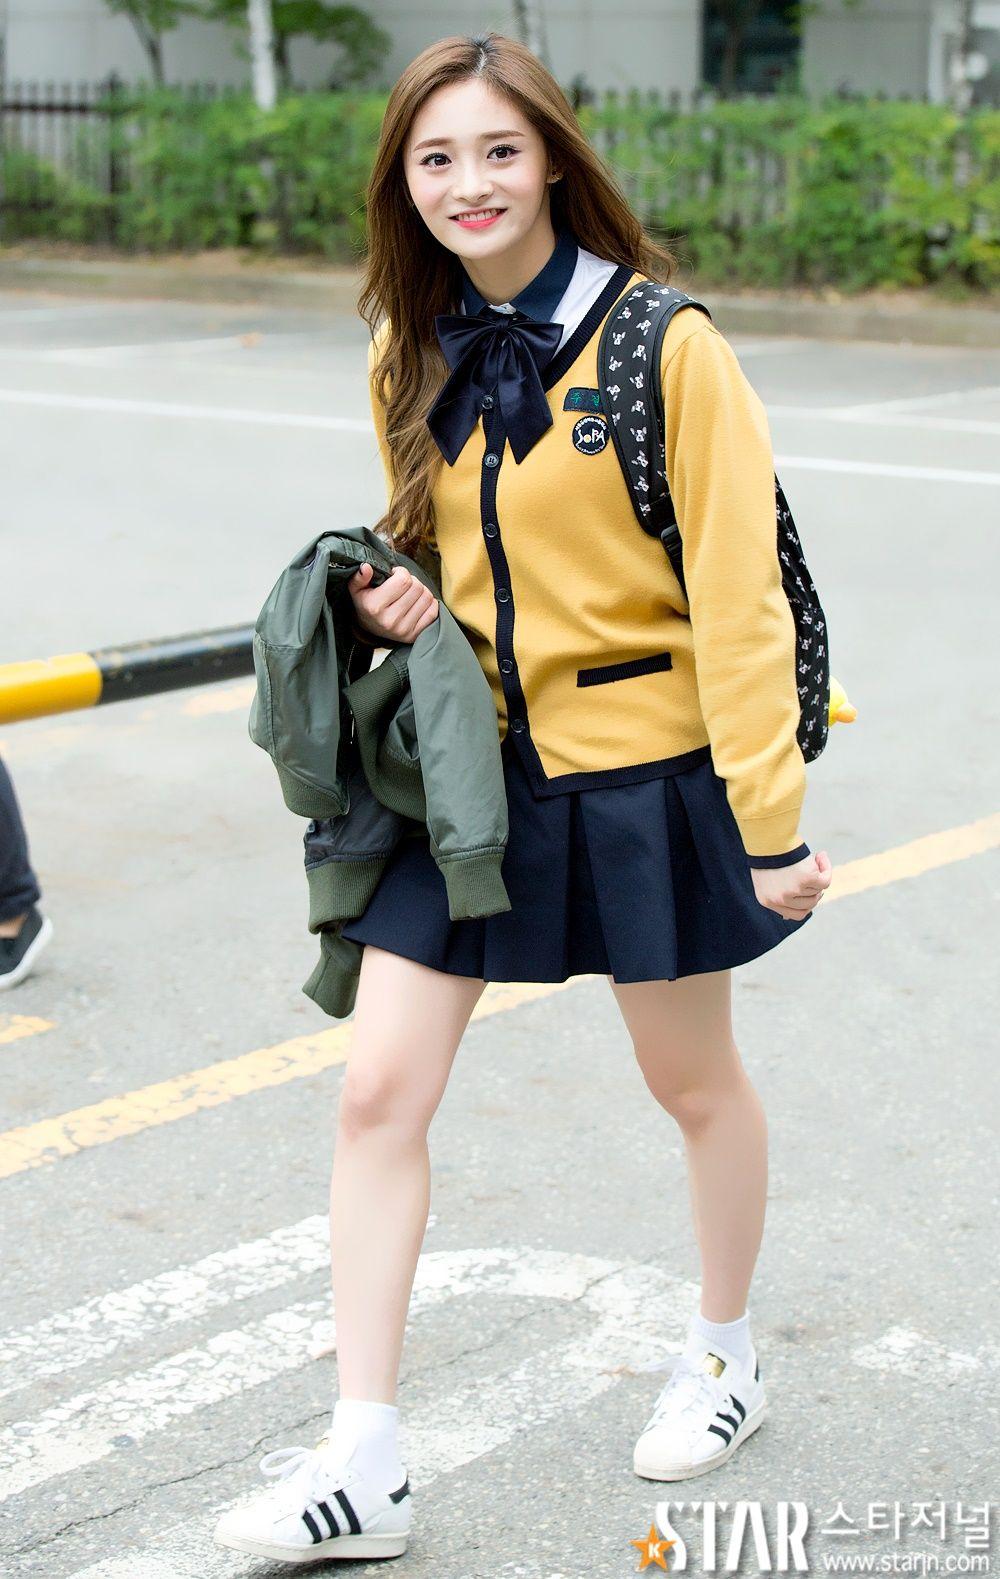 Graduating Idols Kpop High School Graduation High School Graduation Idols Korean High School Graduation Taeyeon Fashion School Fashion High School Fashion